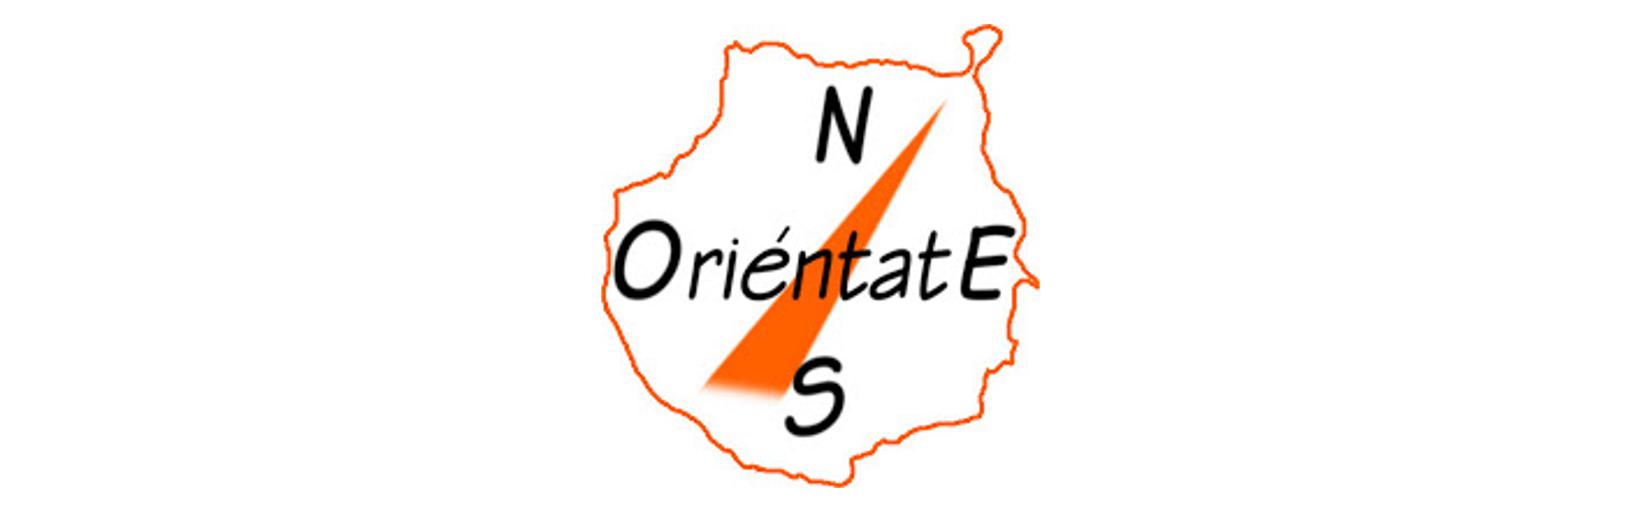 orientate-gcom-orientacion-canarias